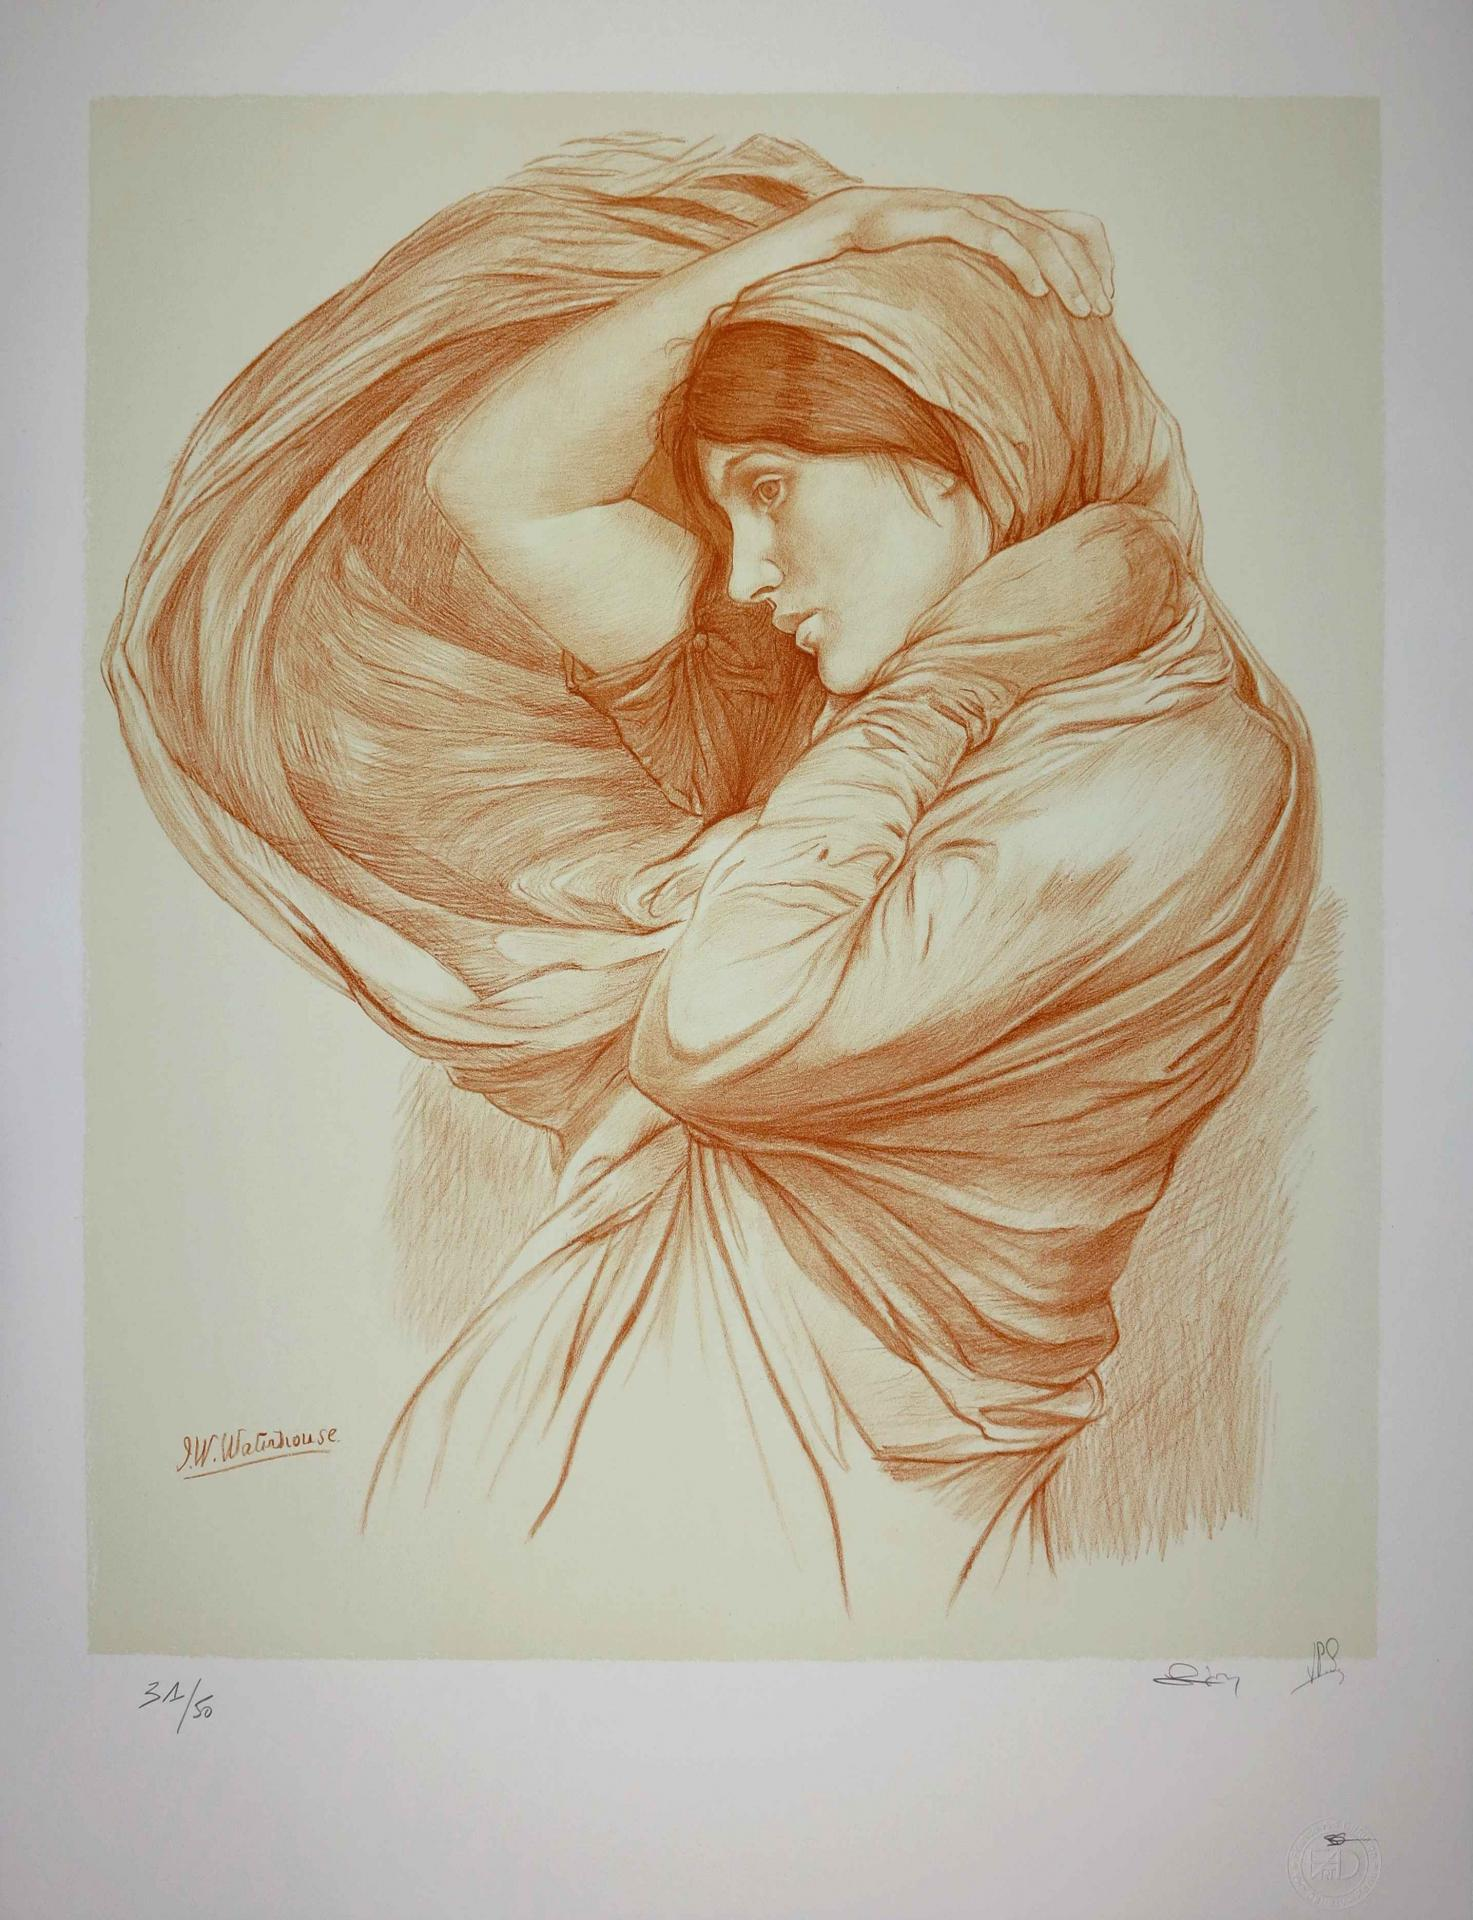 John William Waterhouse LITHOGRAPH